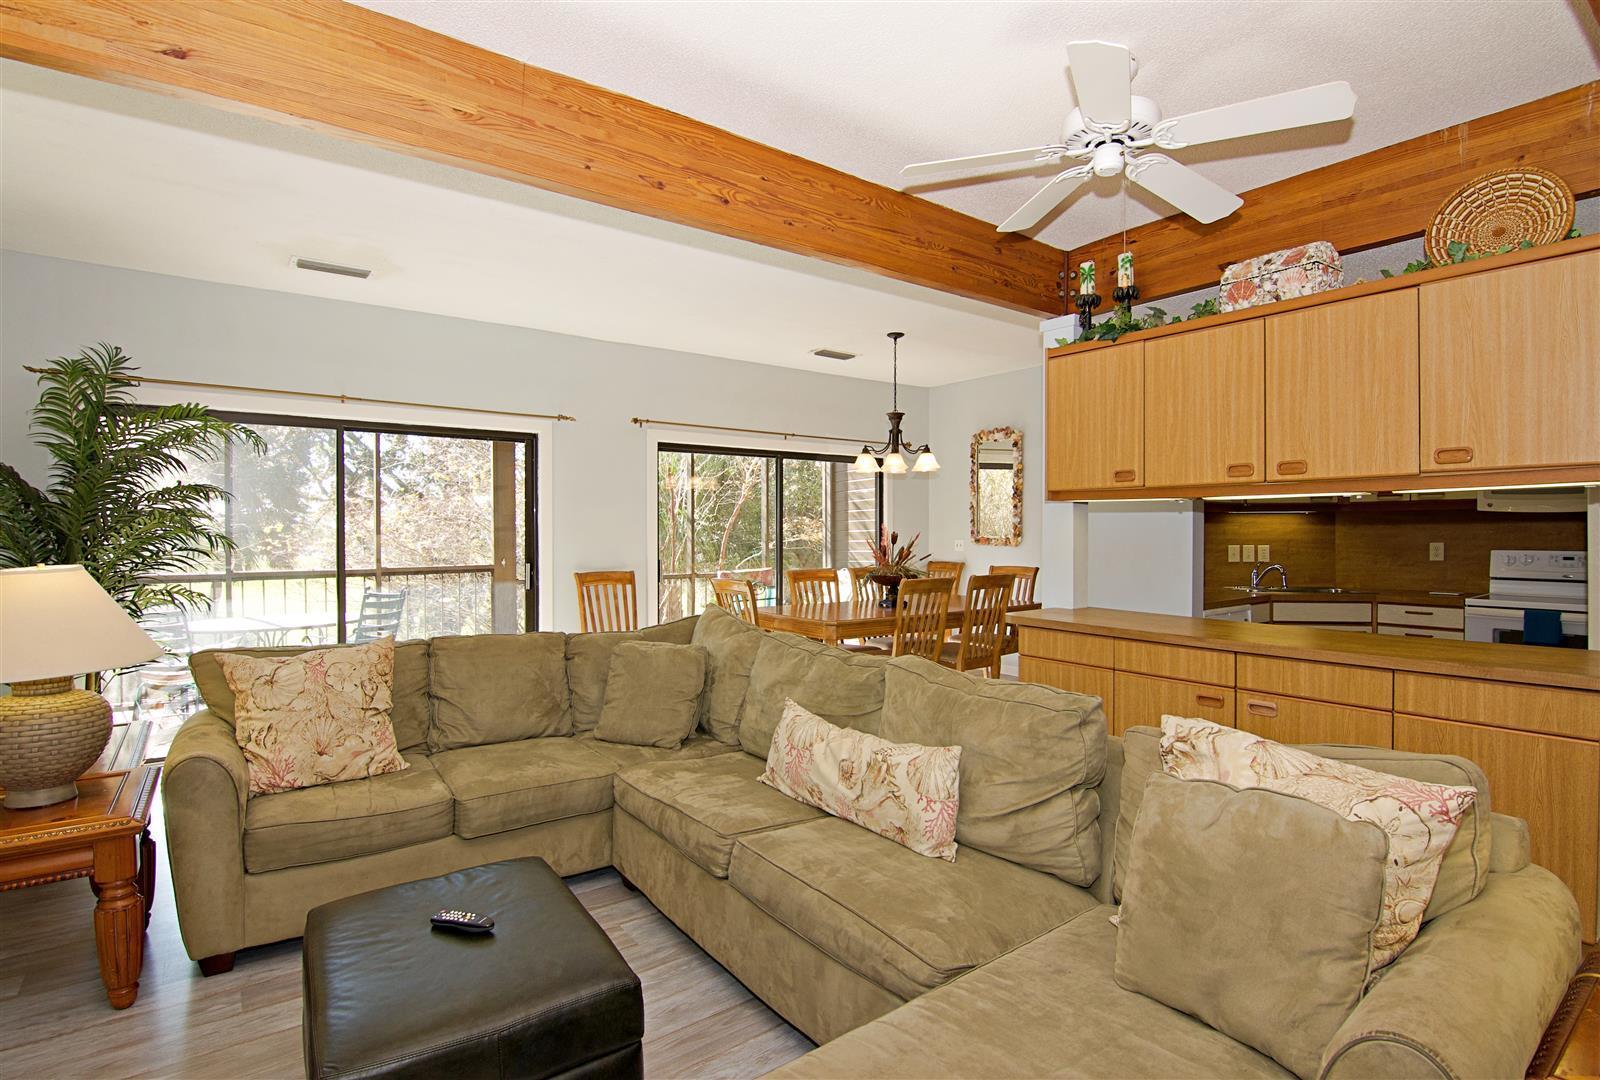 Seabrook Island Homes For Sale - 3020 Ocean Winds, Seabrook Island, SC - 0